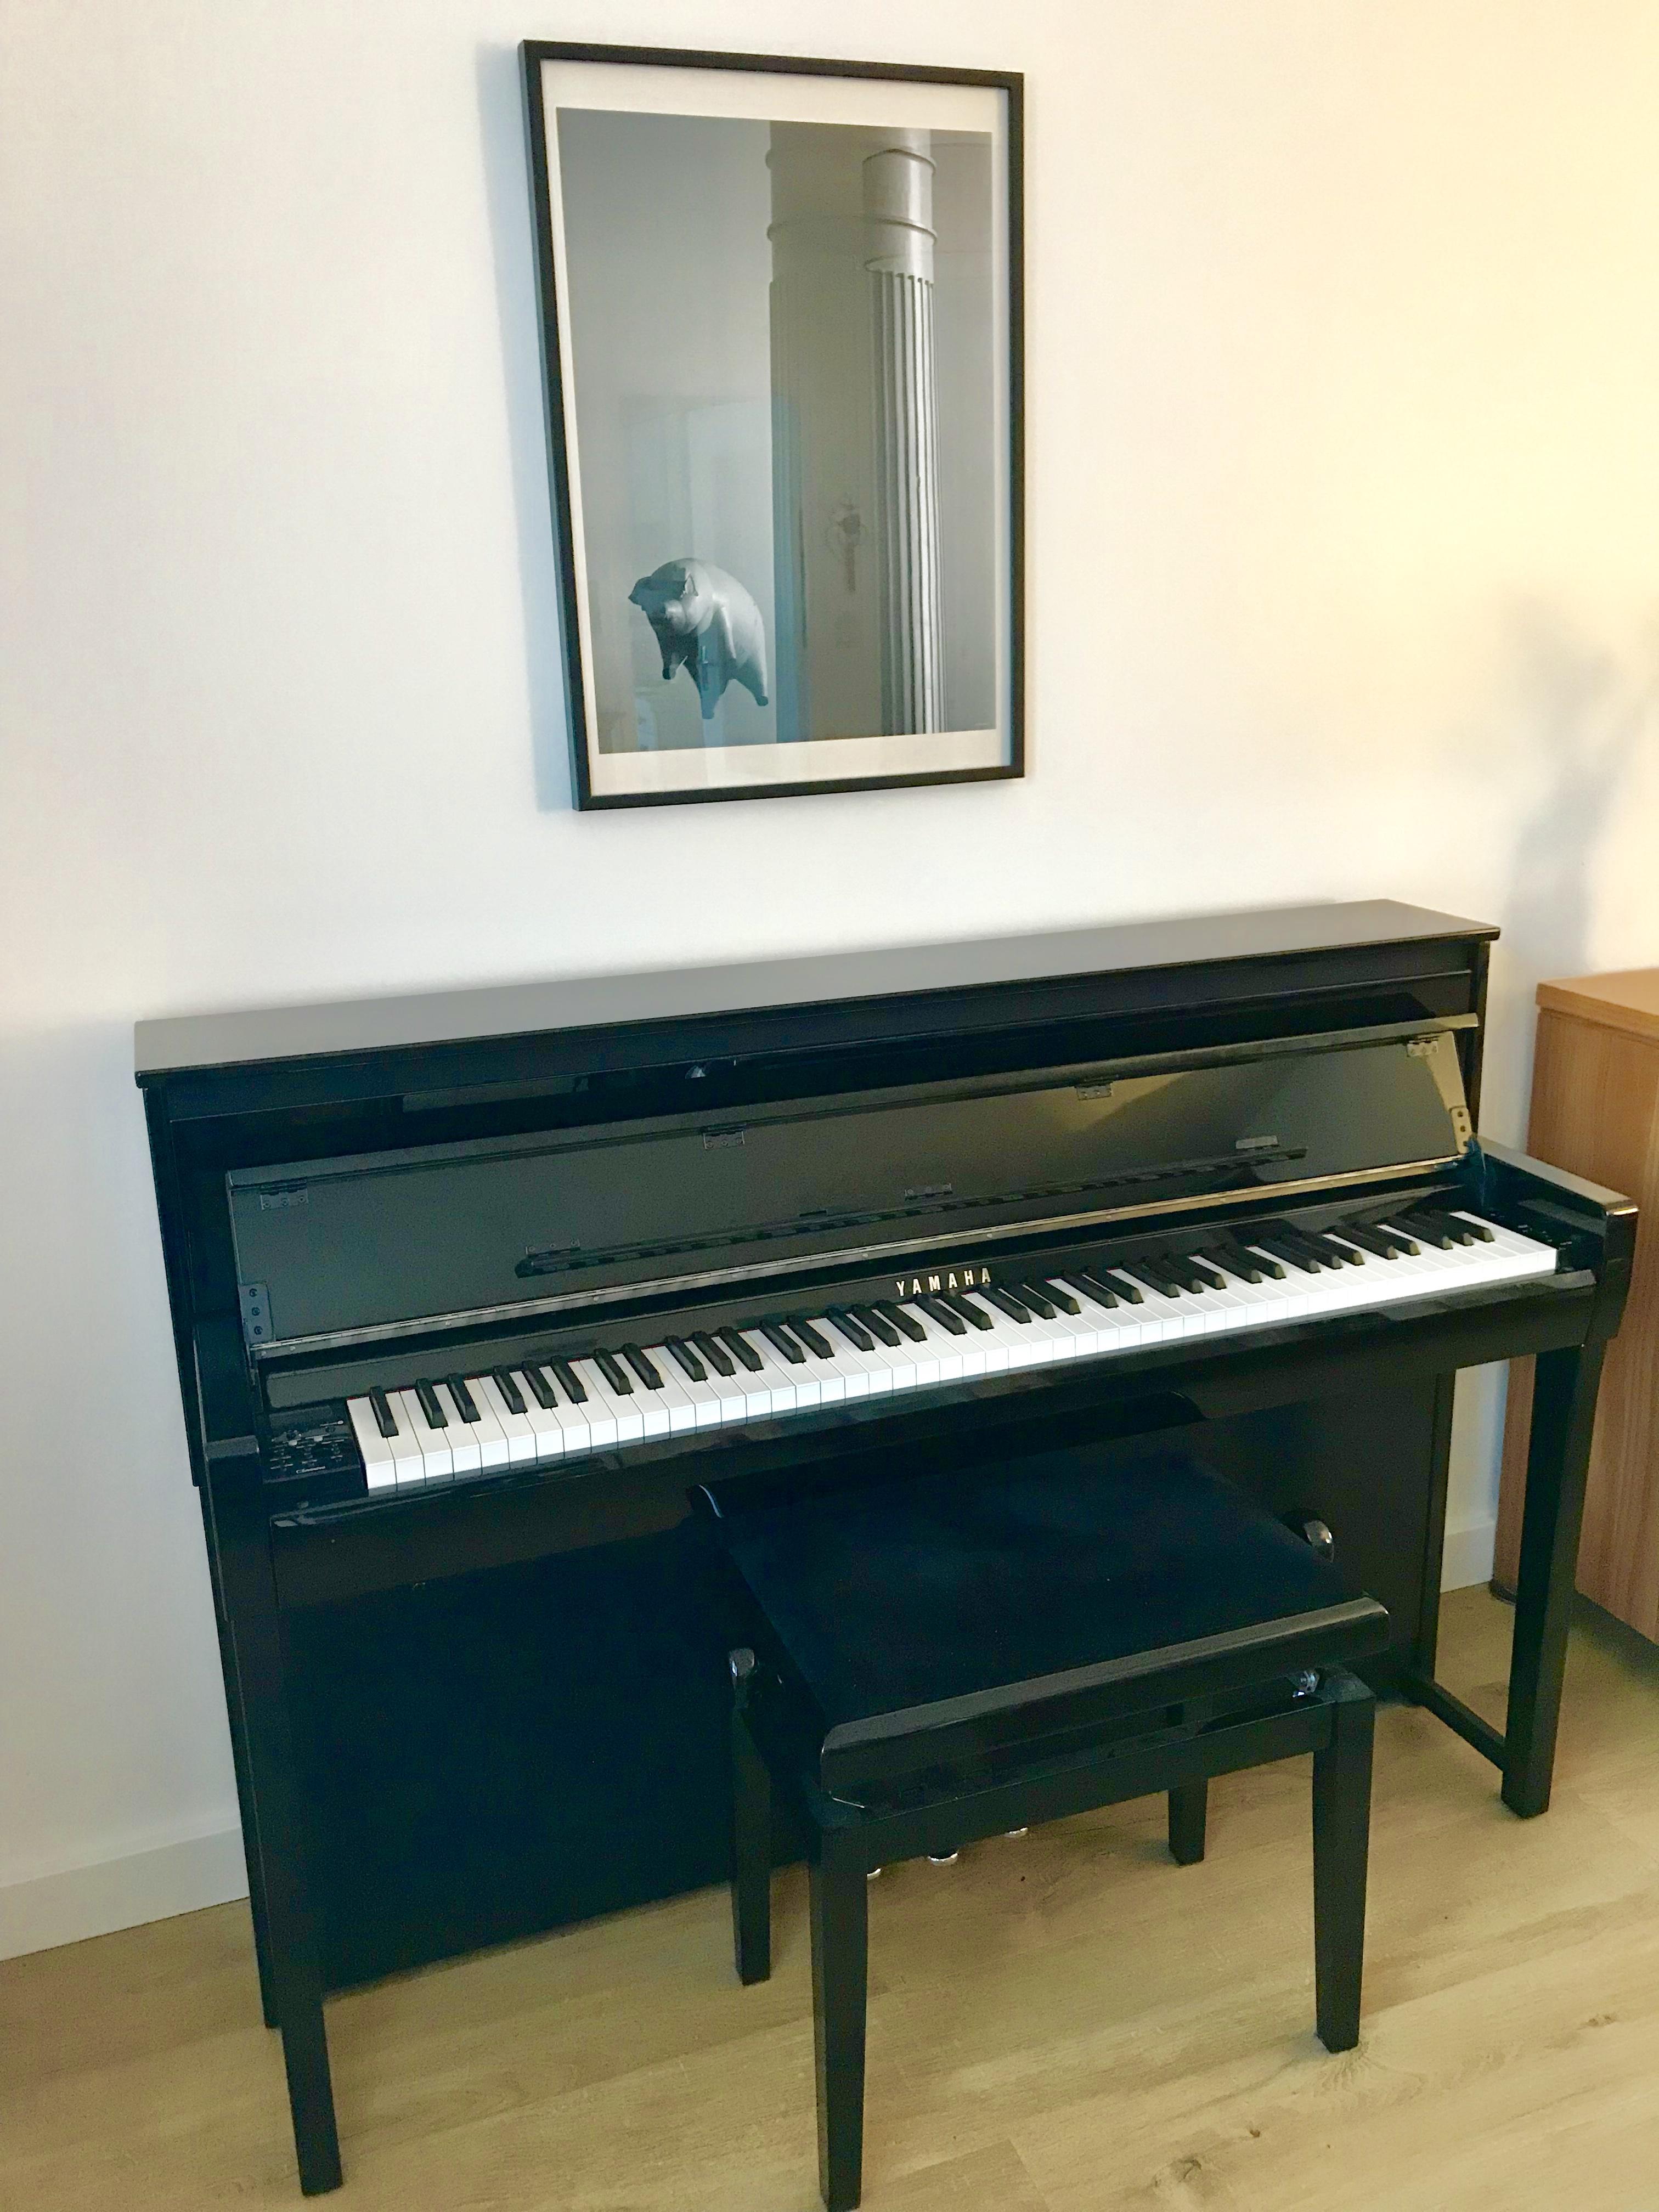 clavinova clp 685 yamaha clavinova clp 685 audiofanzine. Black Bedroom Furniture Sets. Home Design Ideas